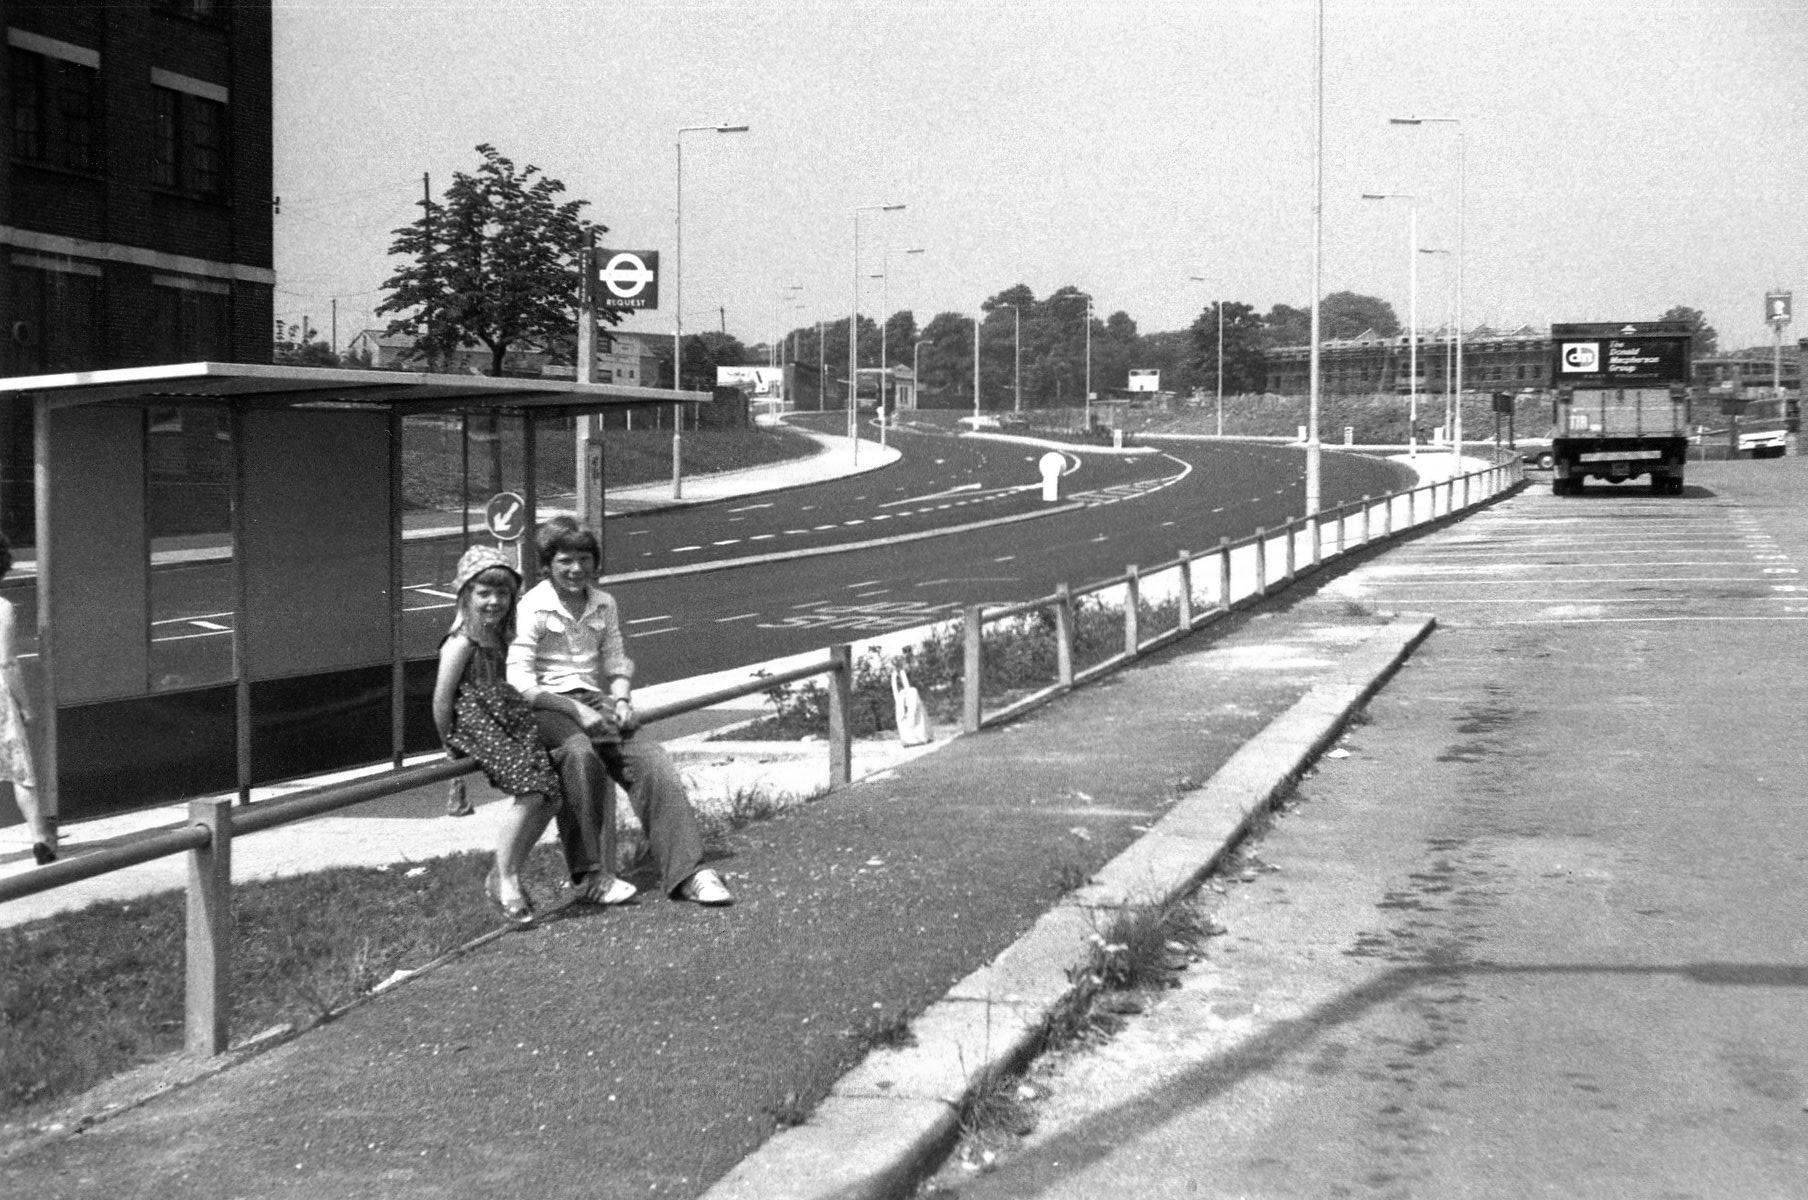 Station Road, N1